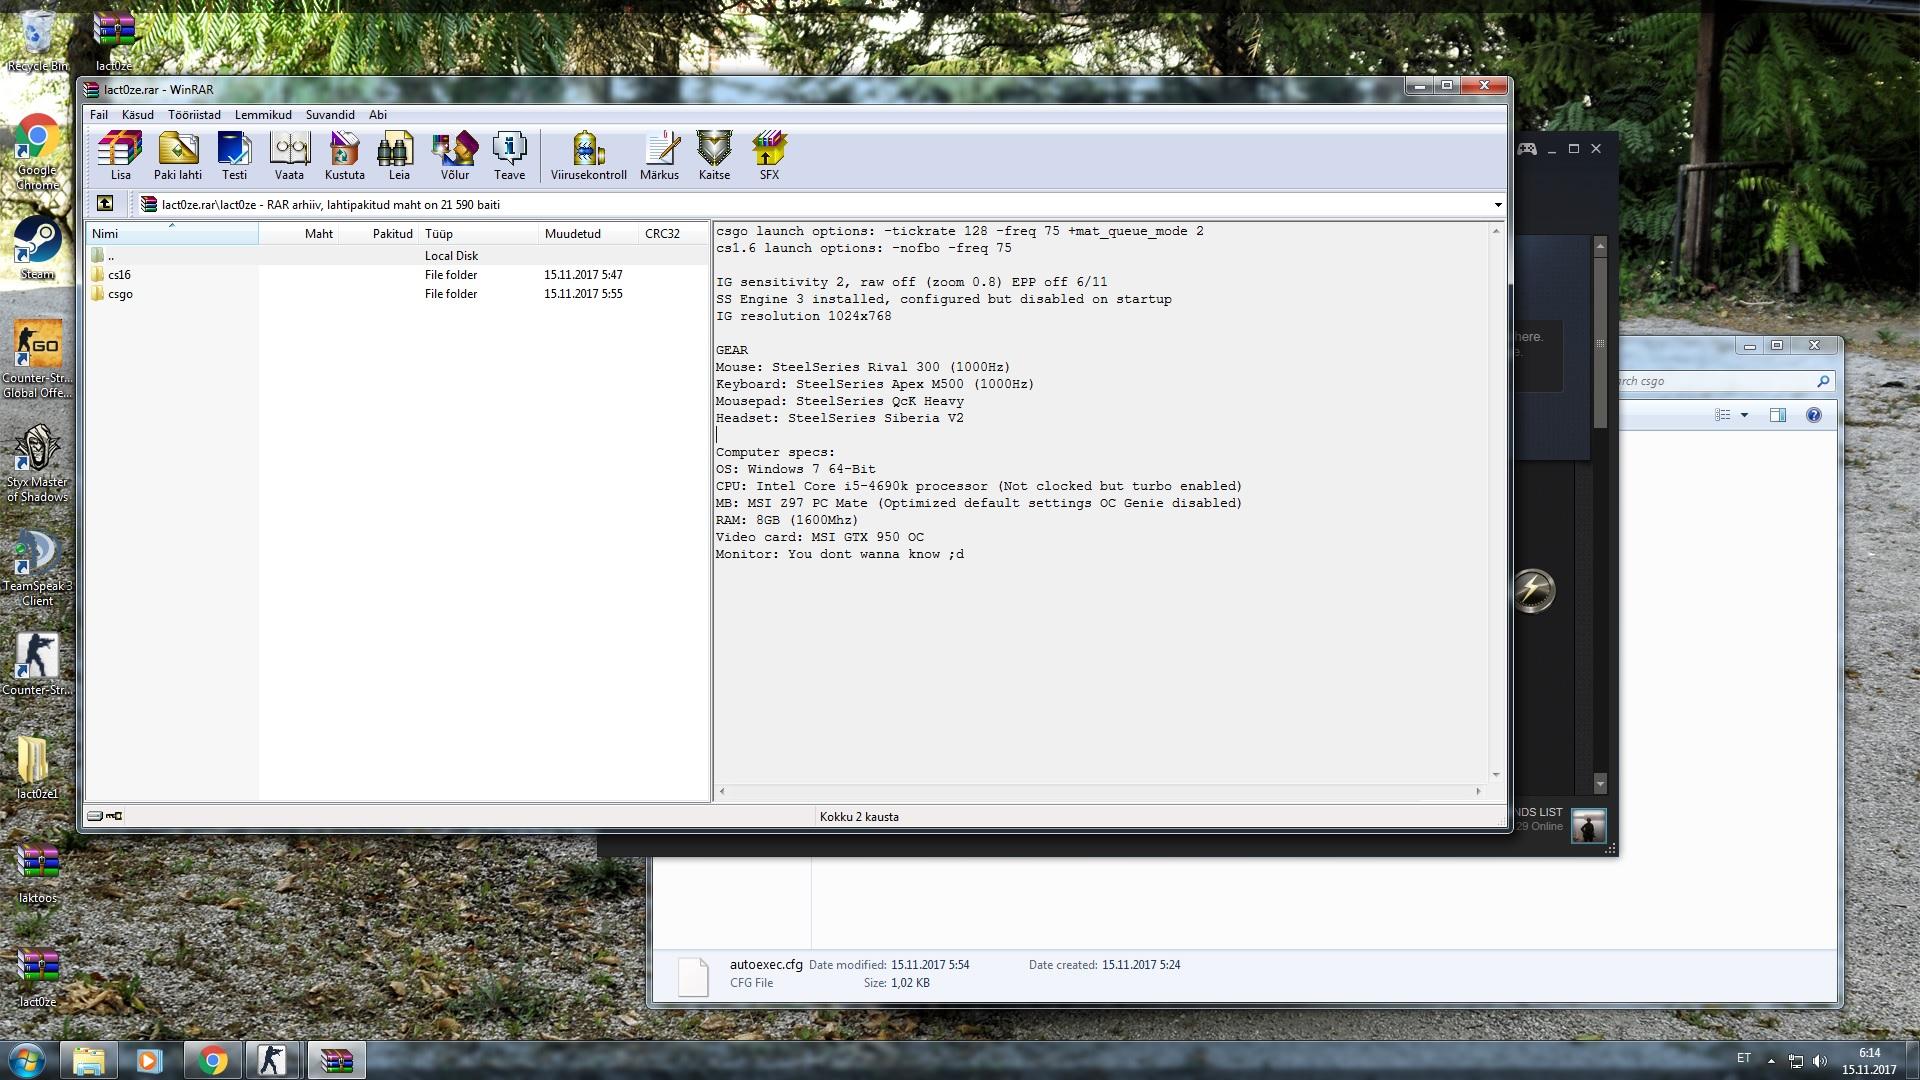 LactozE csgo config settings download - Gamingcfg com